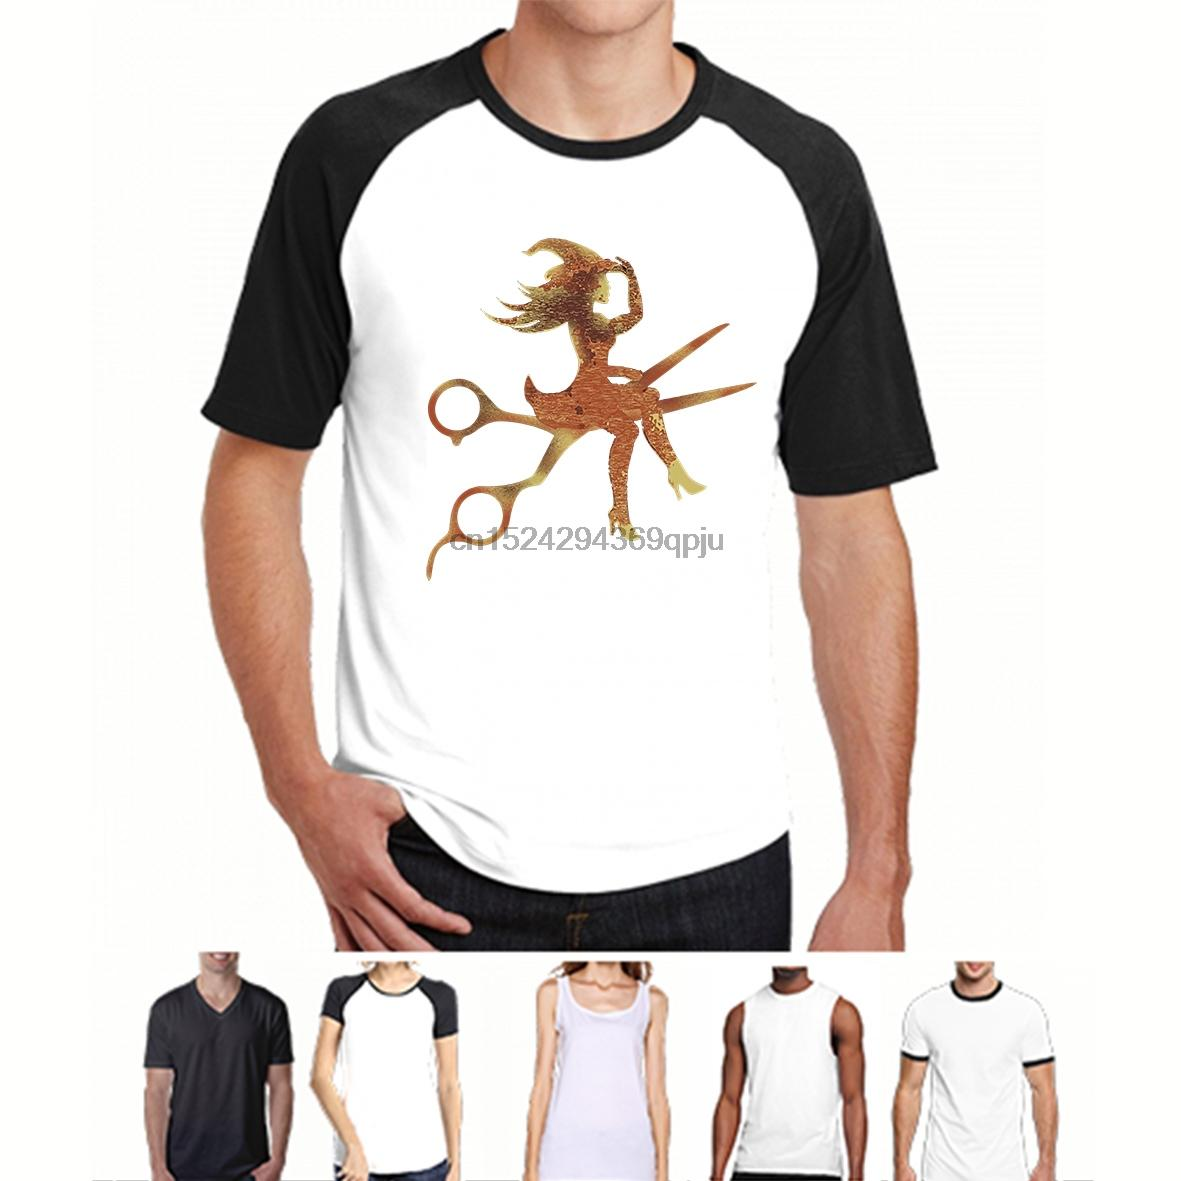 Shirts T shirt Uomo Parrucchieri Parrucchieri magliette T per Halloween donne divertente maglietta novità tshirt (2)